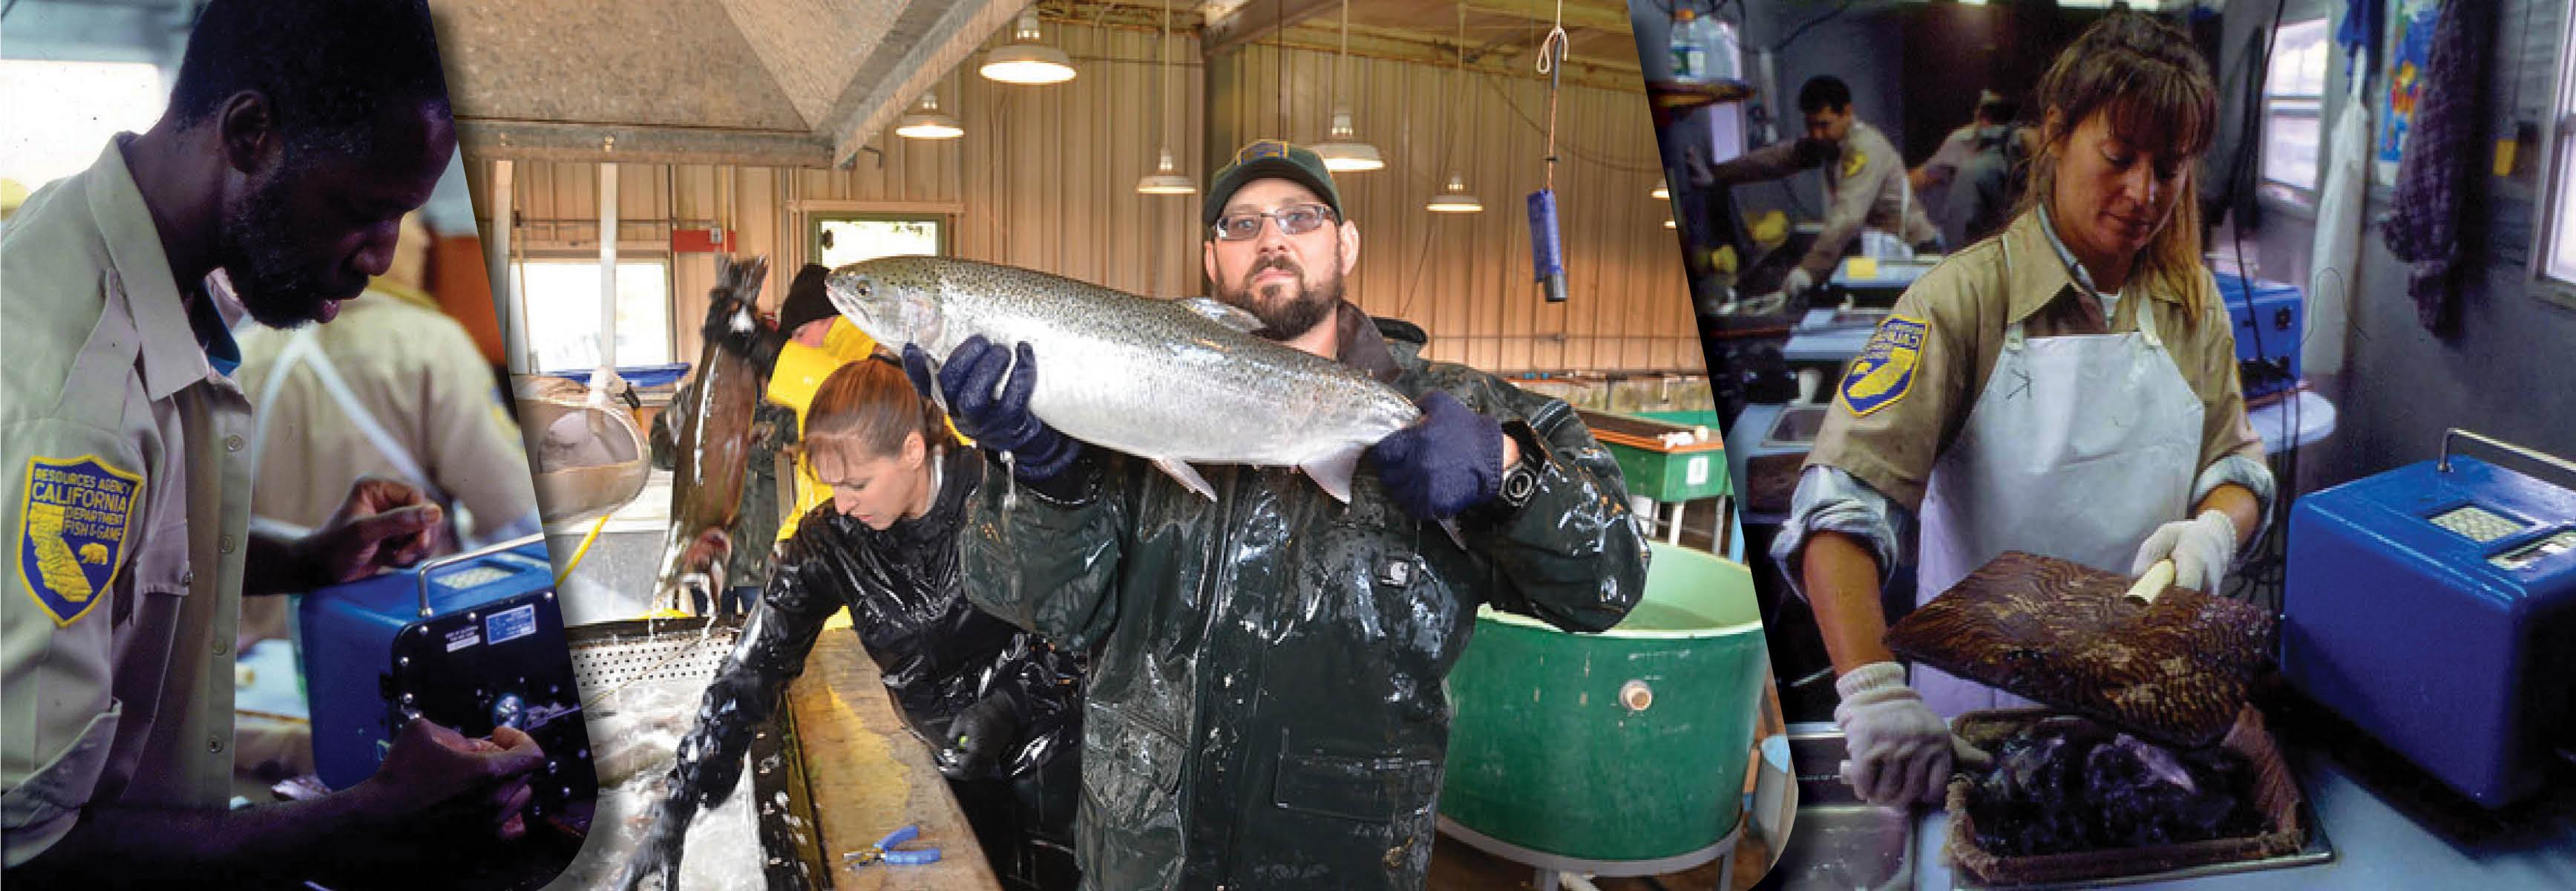 Cdfw Fish Hatcheries Are Hiring Aquaculture Matters